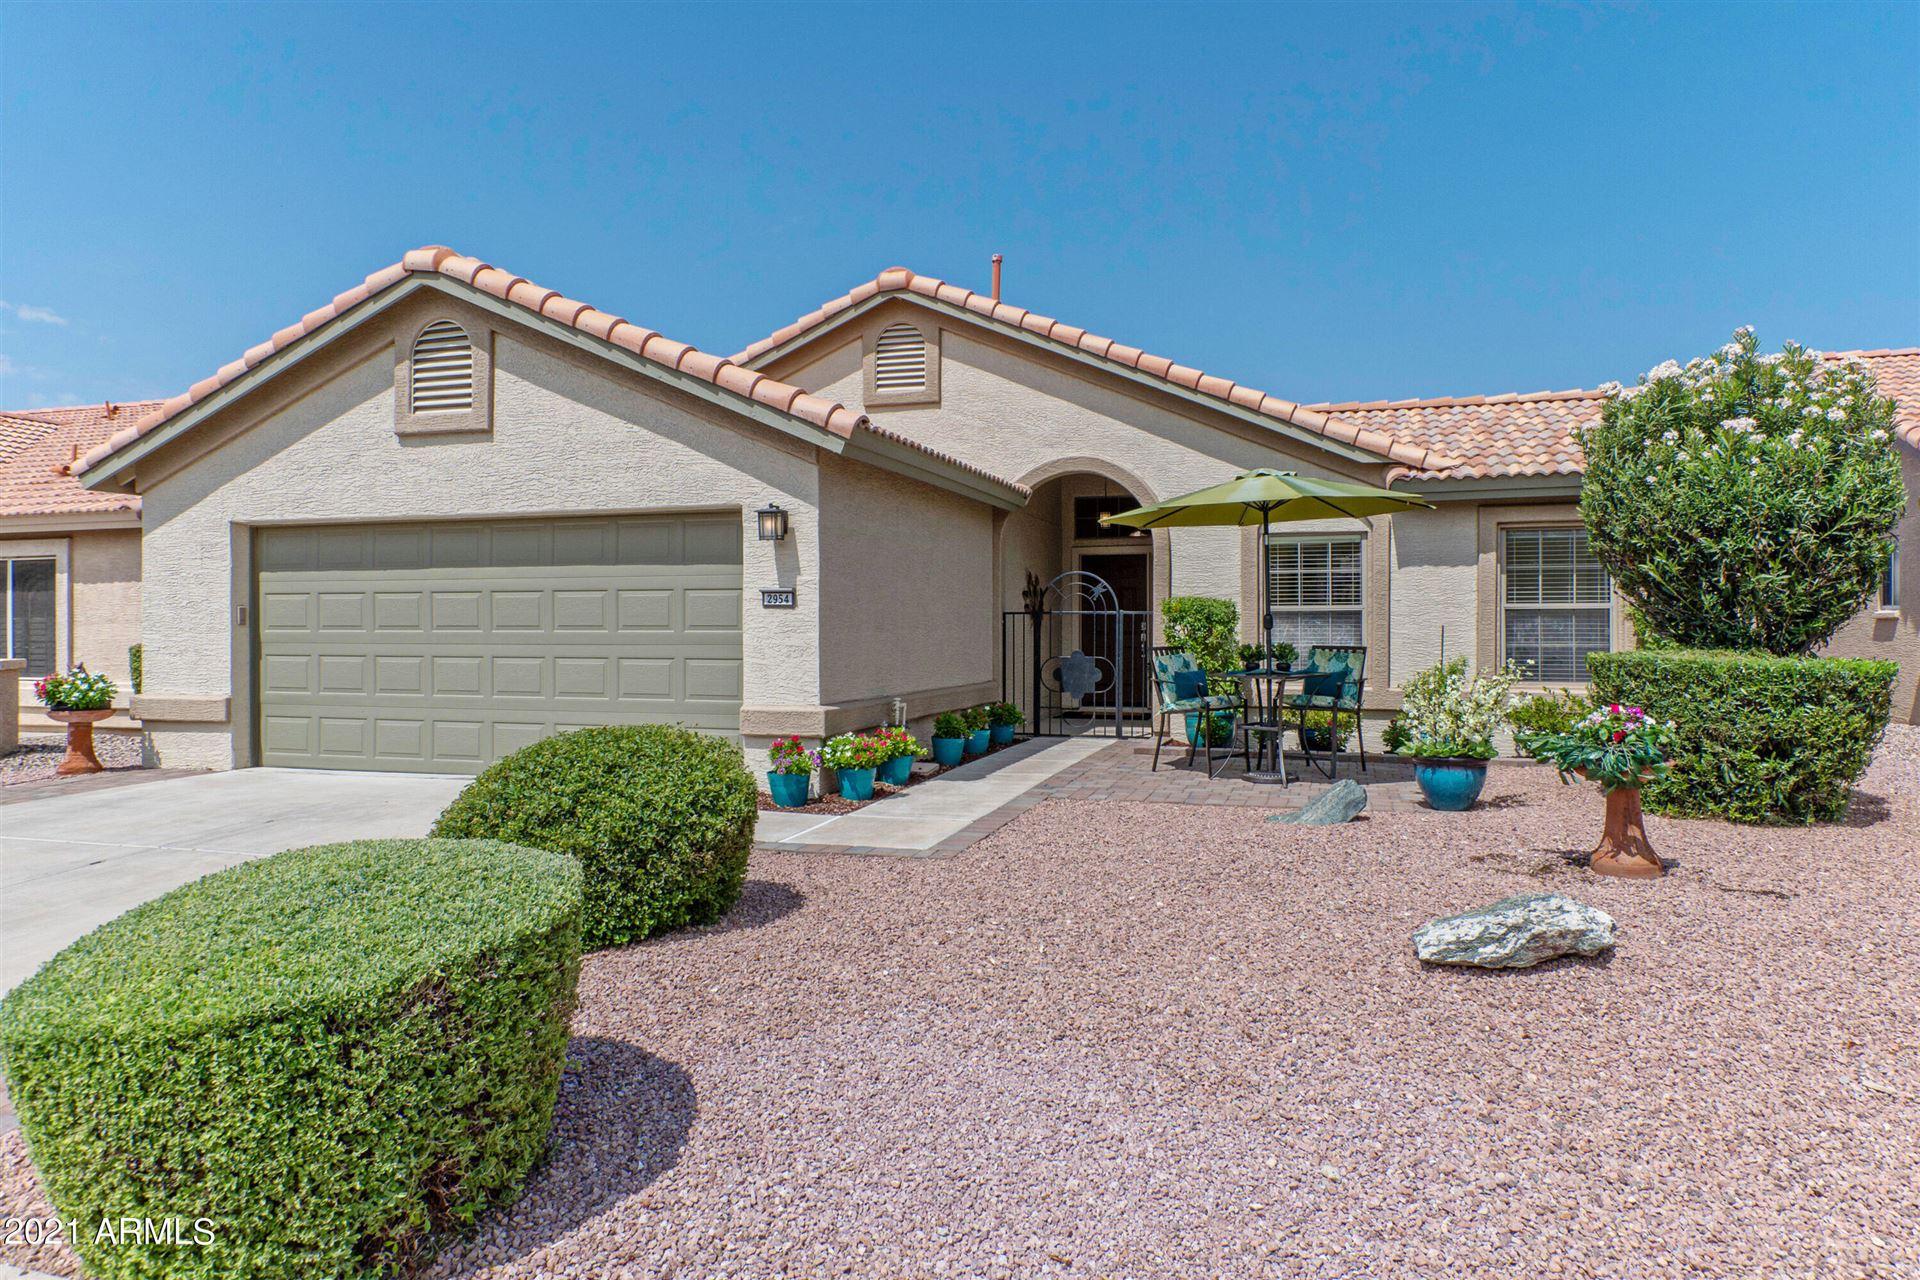 Photo of 2954 N 147TH Lane, Goodyear, AZ 85395 (MLS # 6267690)